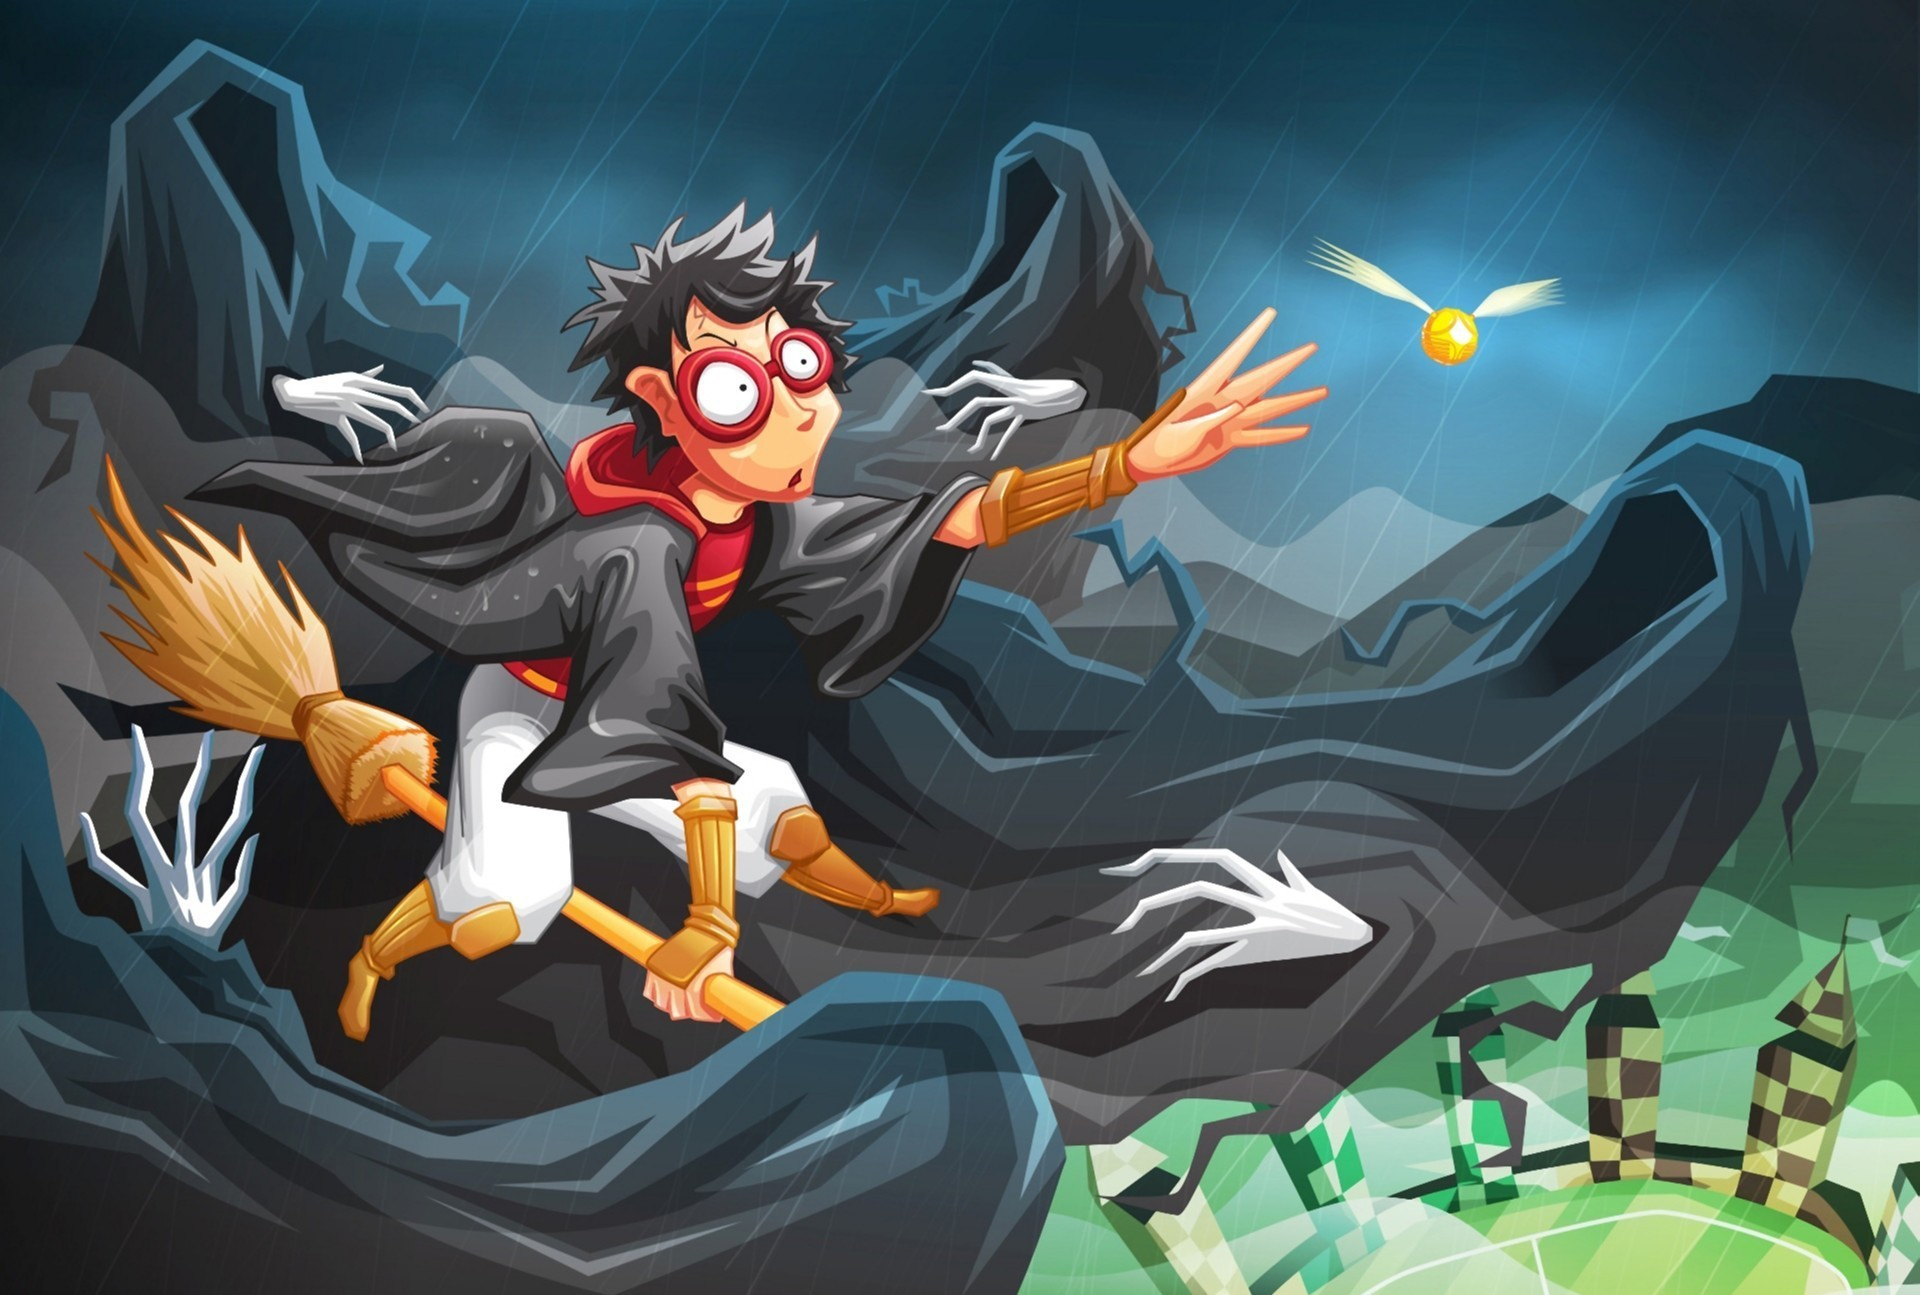 … Popular Harry Potter Animated Wallpaper Wallpaper Desktop Background  Full Screen HD HD Phone Wallpapers Wallpaper Desktop